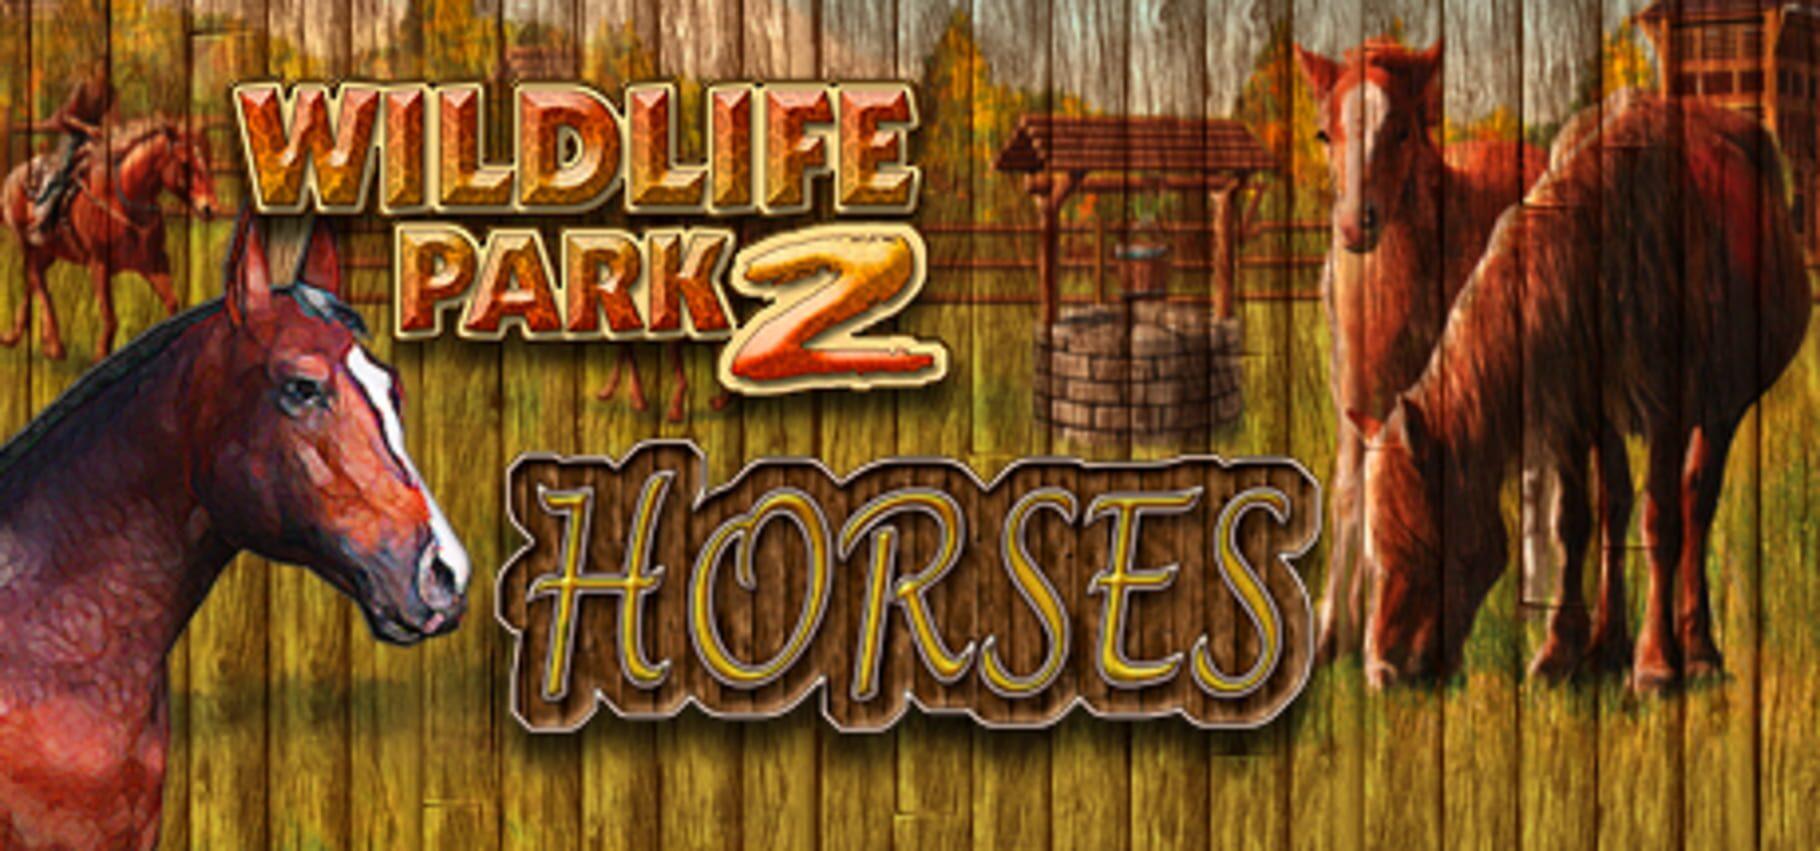 buy Wildlife Park 2: Horses cd key for all platform